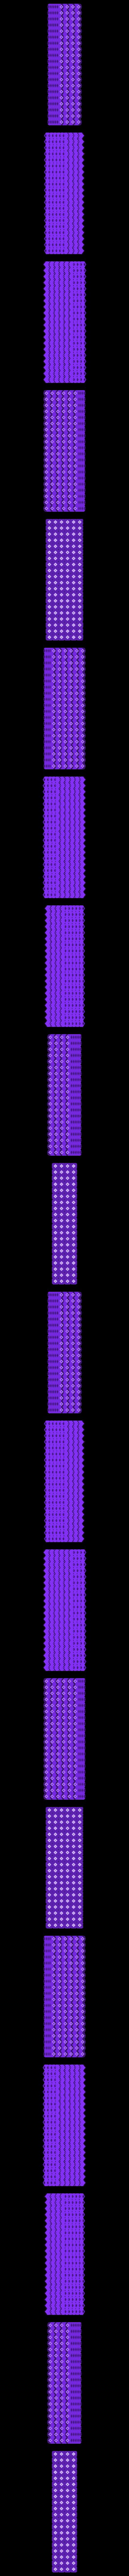 antiwarping_d10w08x4y20z6a0.stl Download free STL file Anti-Warping Block, Truncated Octahedrons • Model to 3D print, zootopia3Dprints